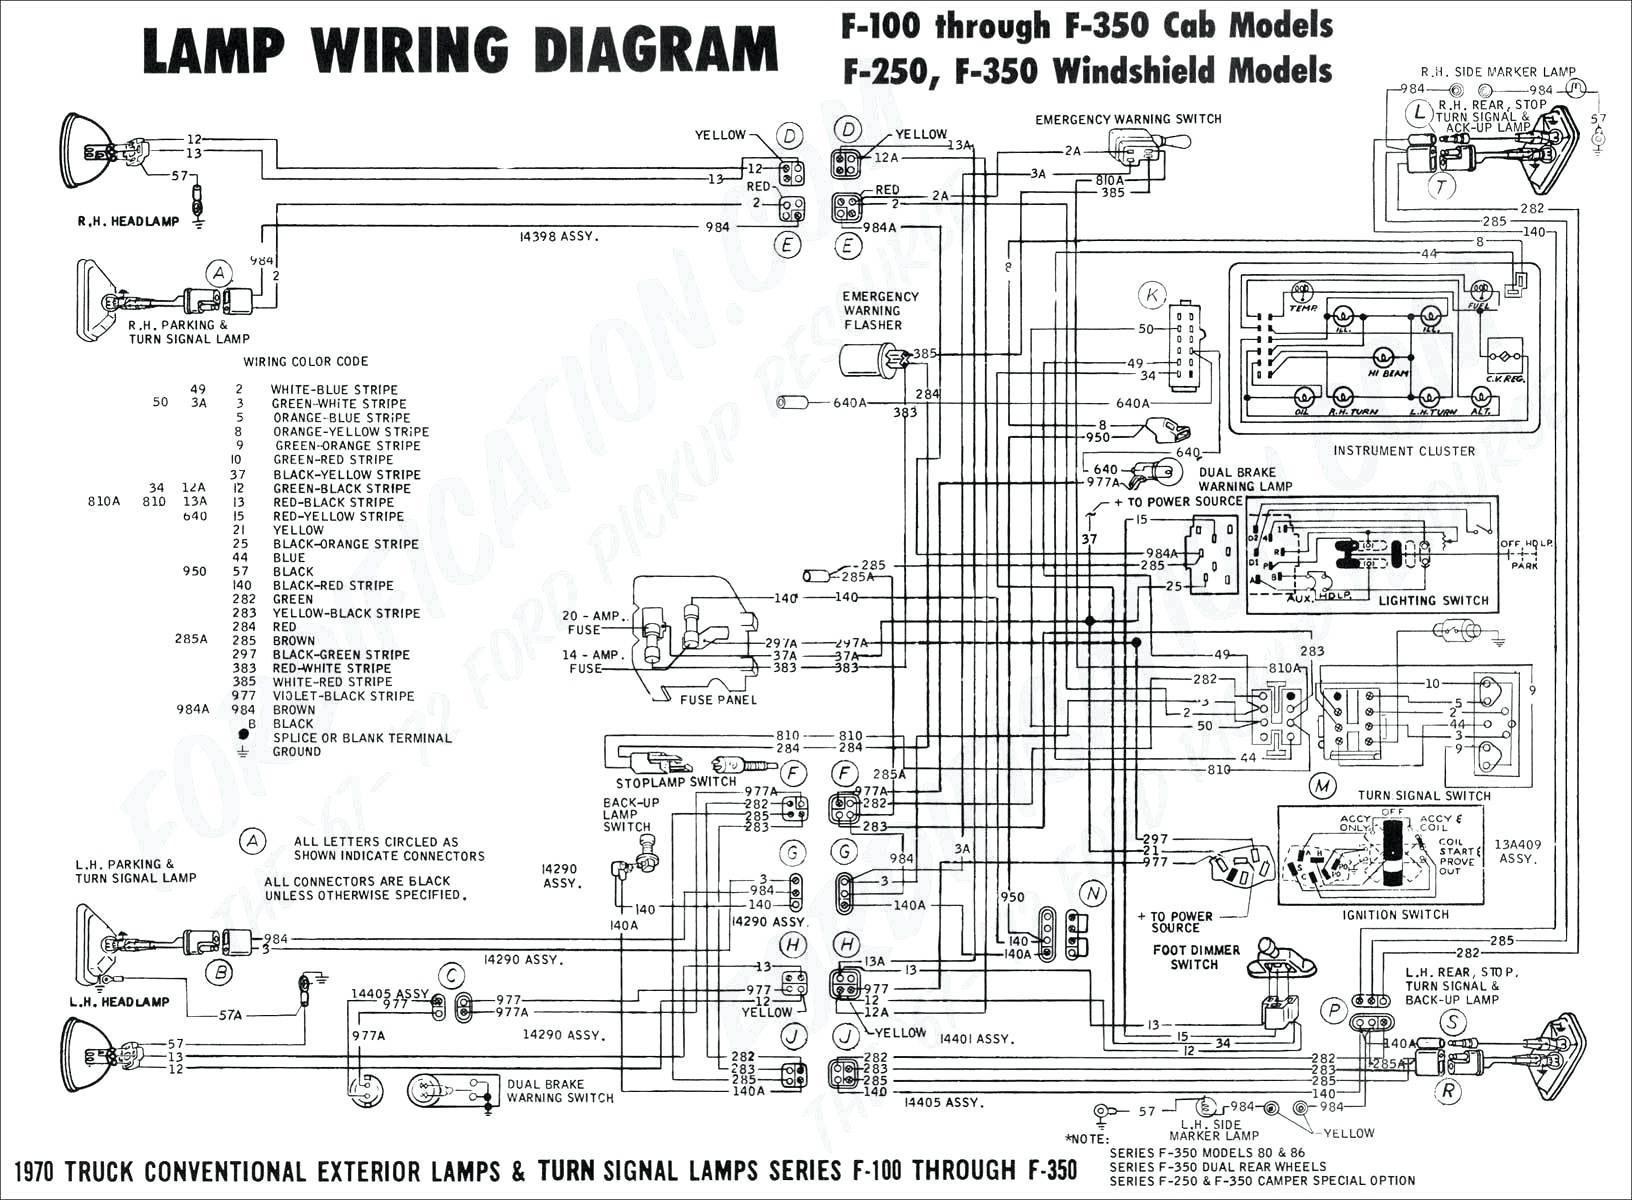 Forward Reverse Switch Wiring Diagram Ethernet End Wiring Diagram Of Forward Reverse Switch Wiring Diagram